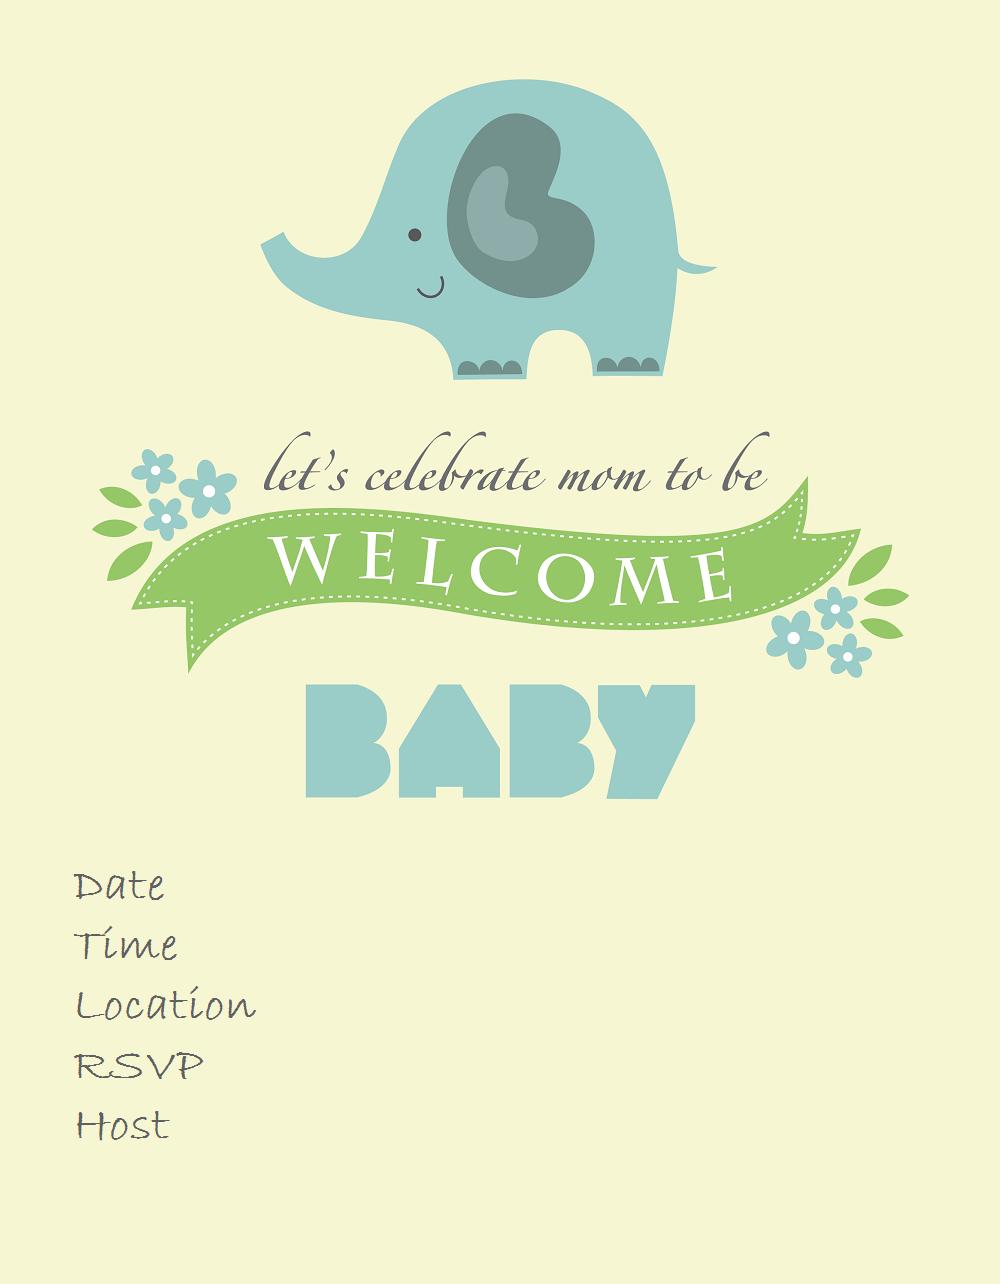 Free Printable Baby Shower Invitations - Baby Shower Ideas - Themes - Free Printable Elephant Baby Shower Invitations